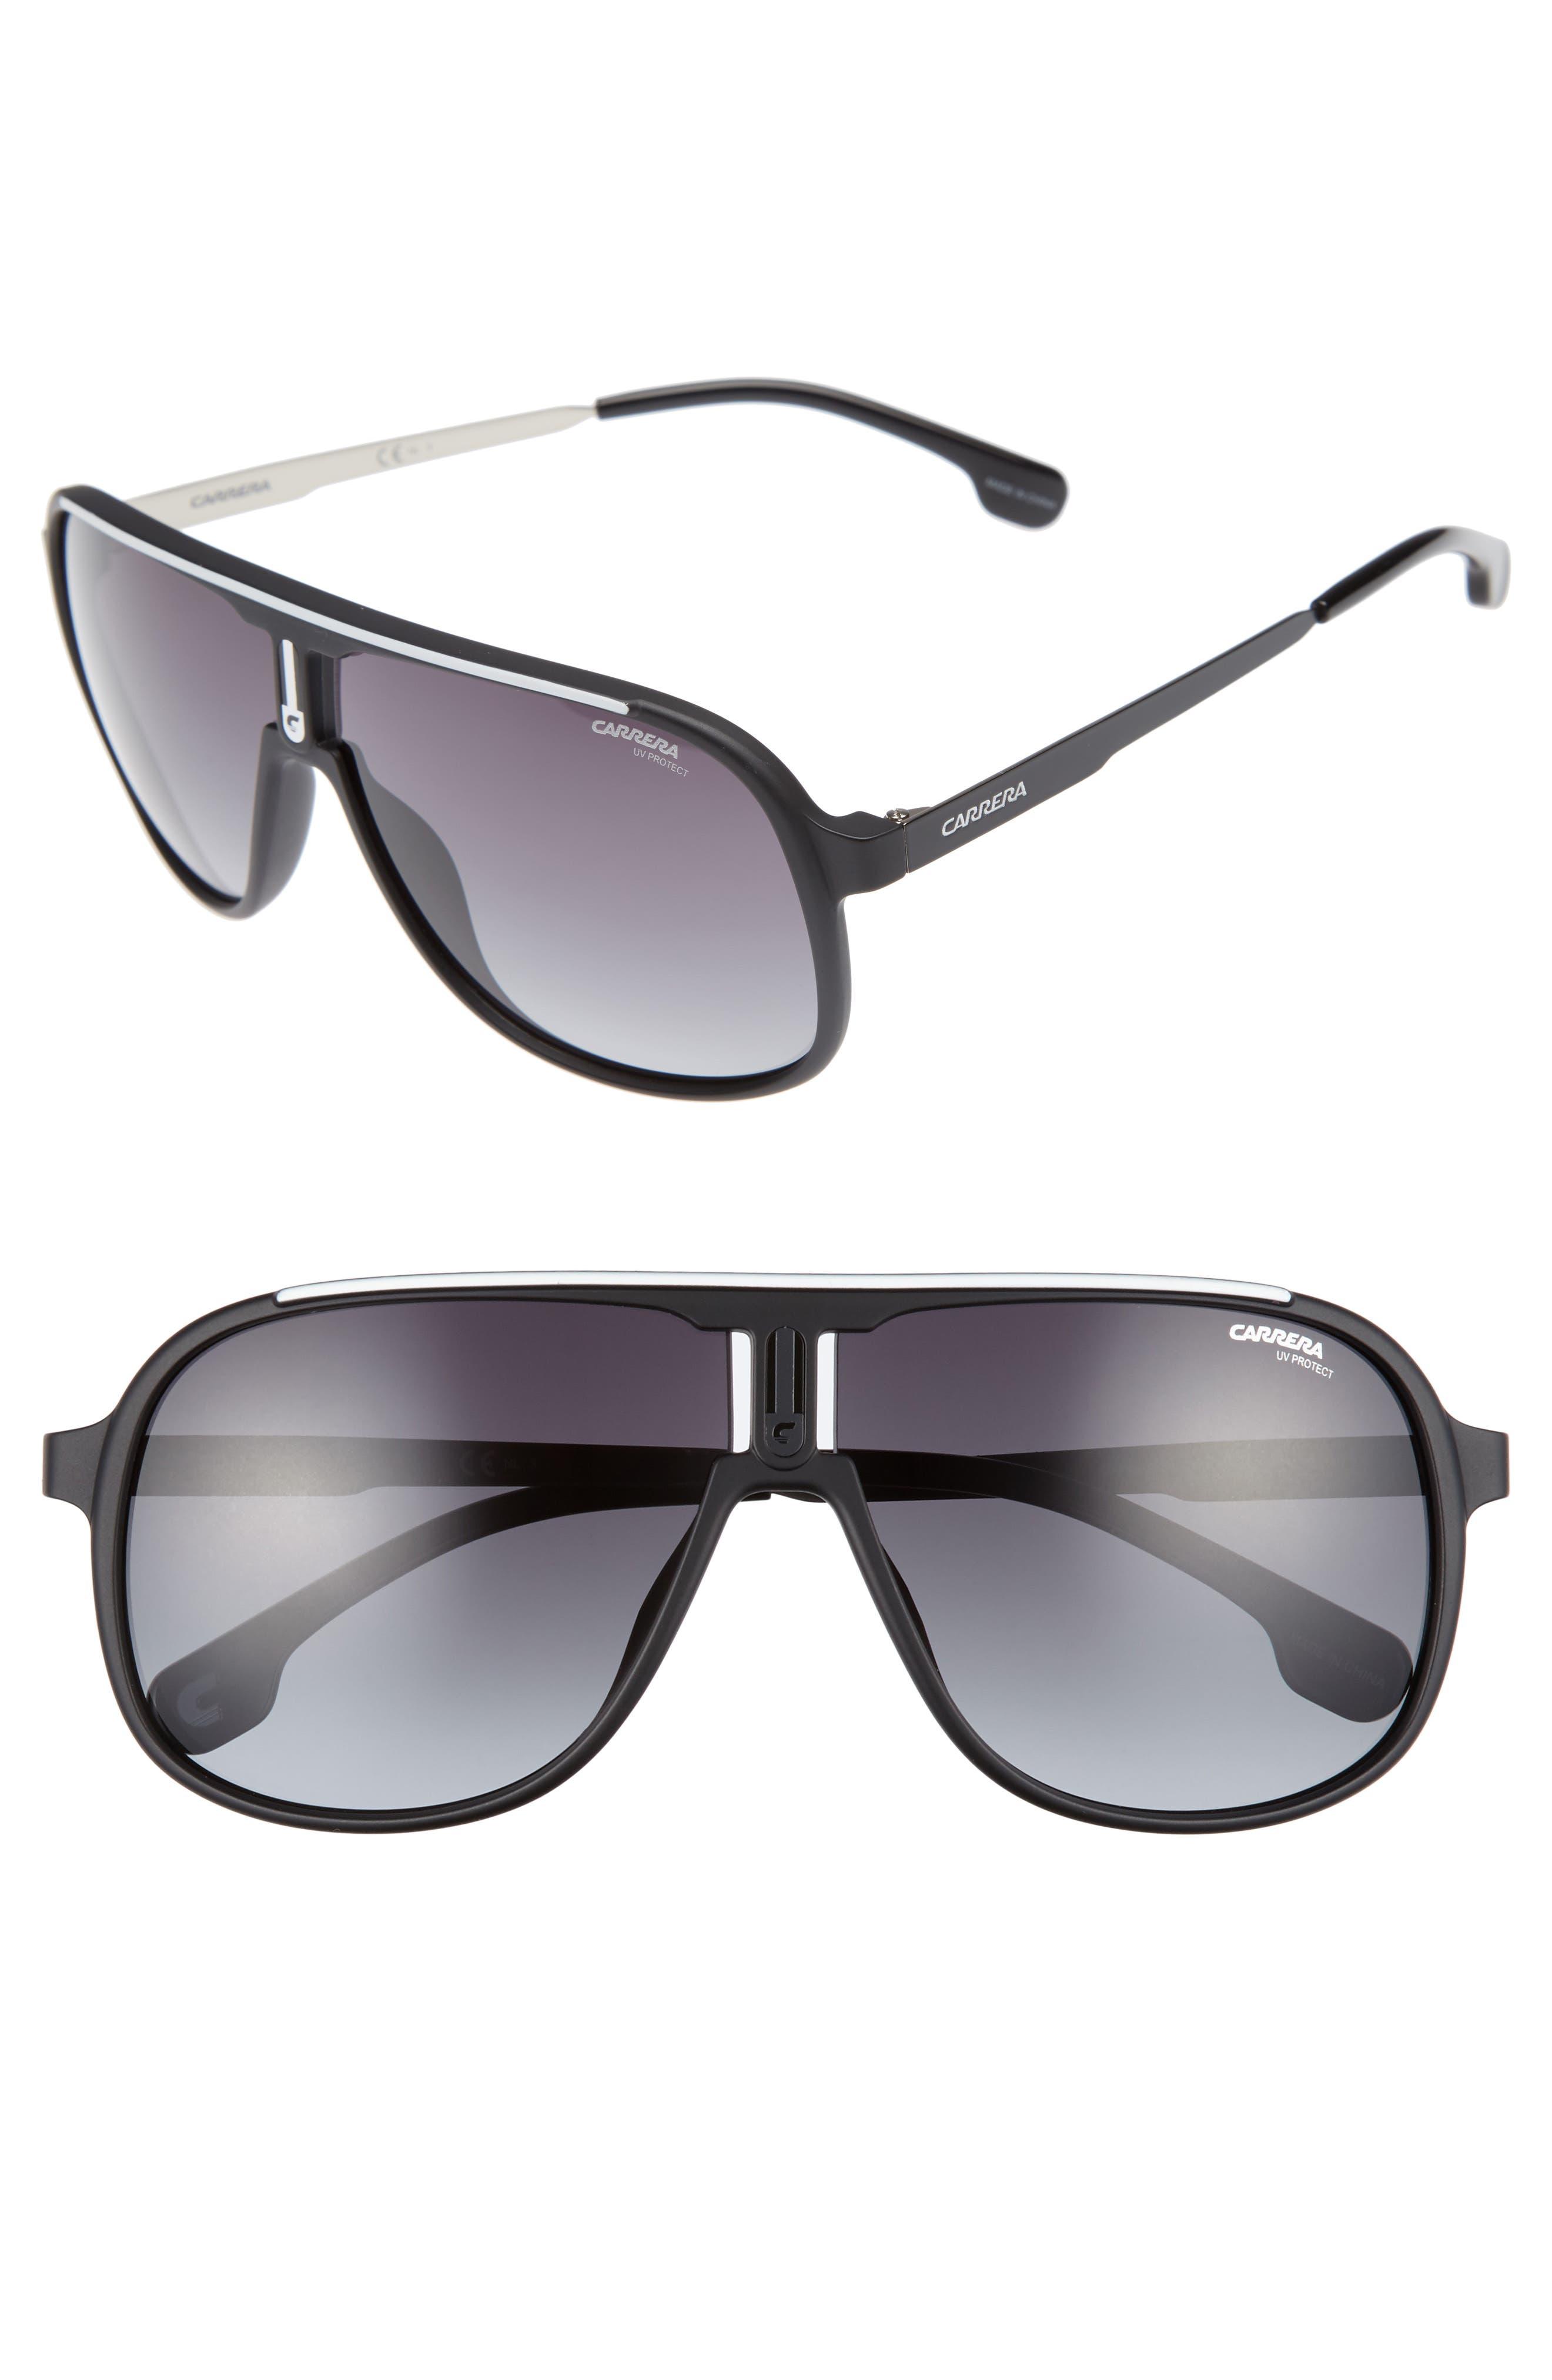 Alternate Image 1 Selected - Carrera Eyewear 62mm Sunglasses